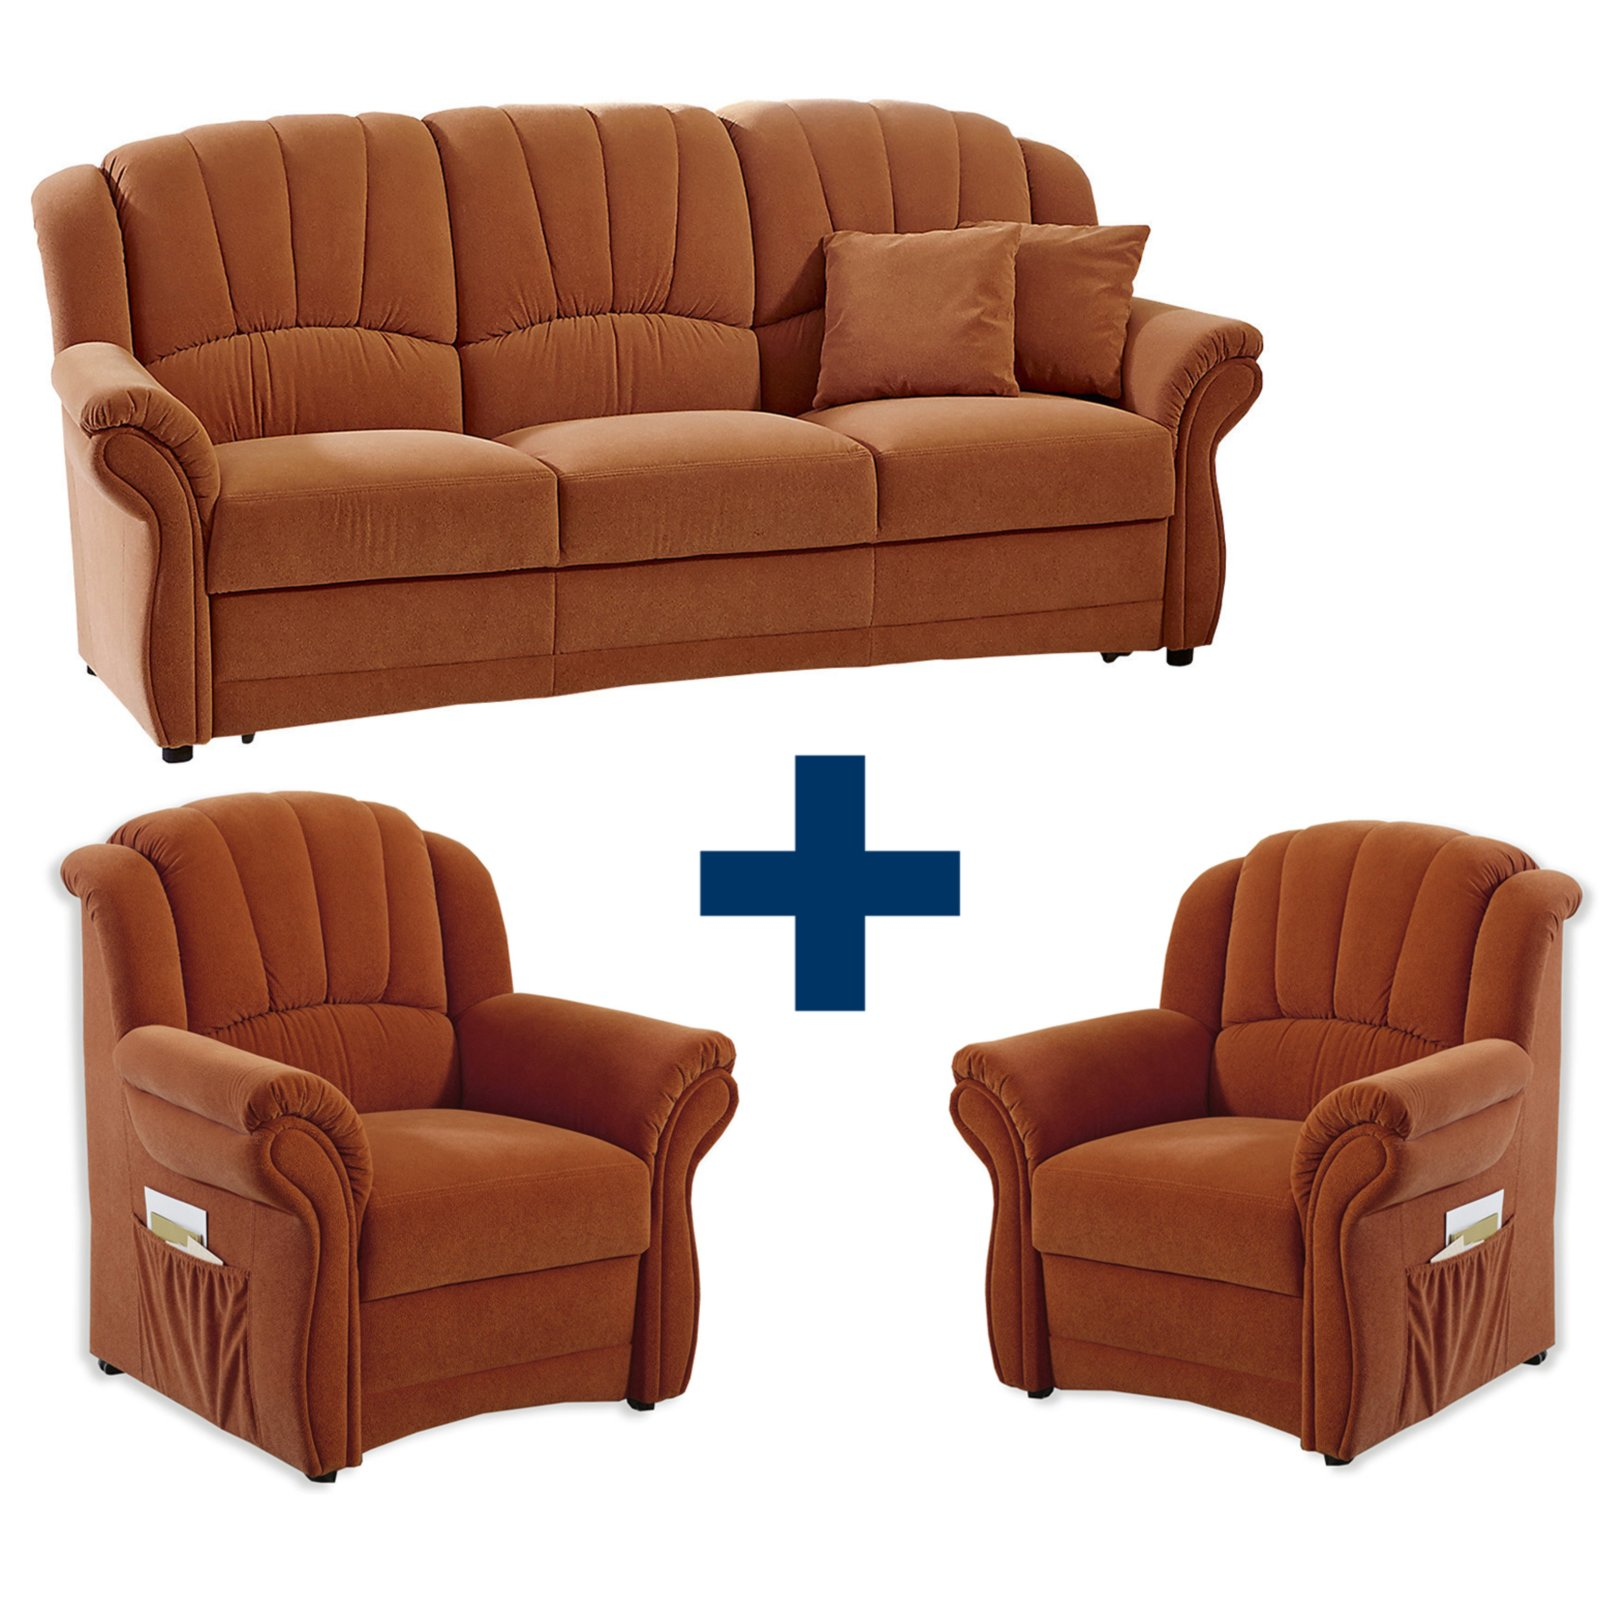 Polster Set In Feeling 2 Sessel Und 3 Sitzer Sofa Terra